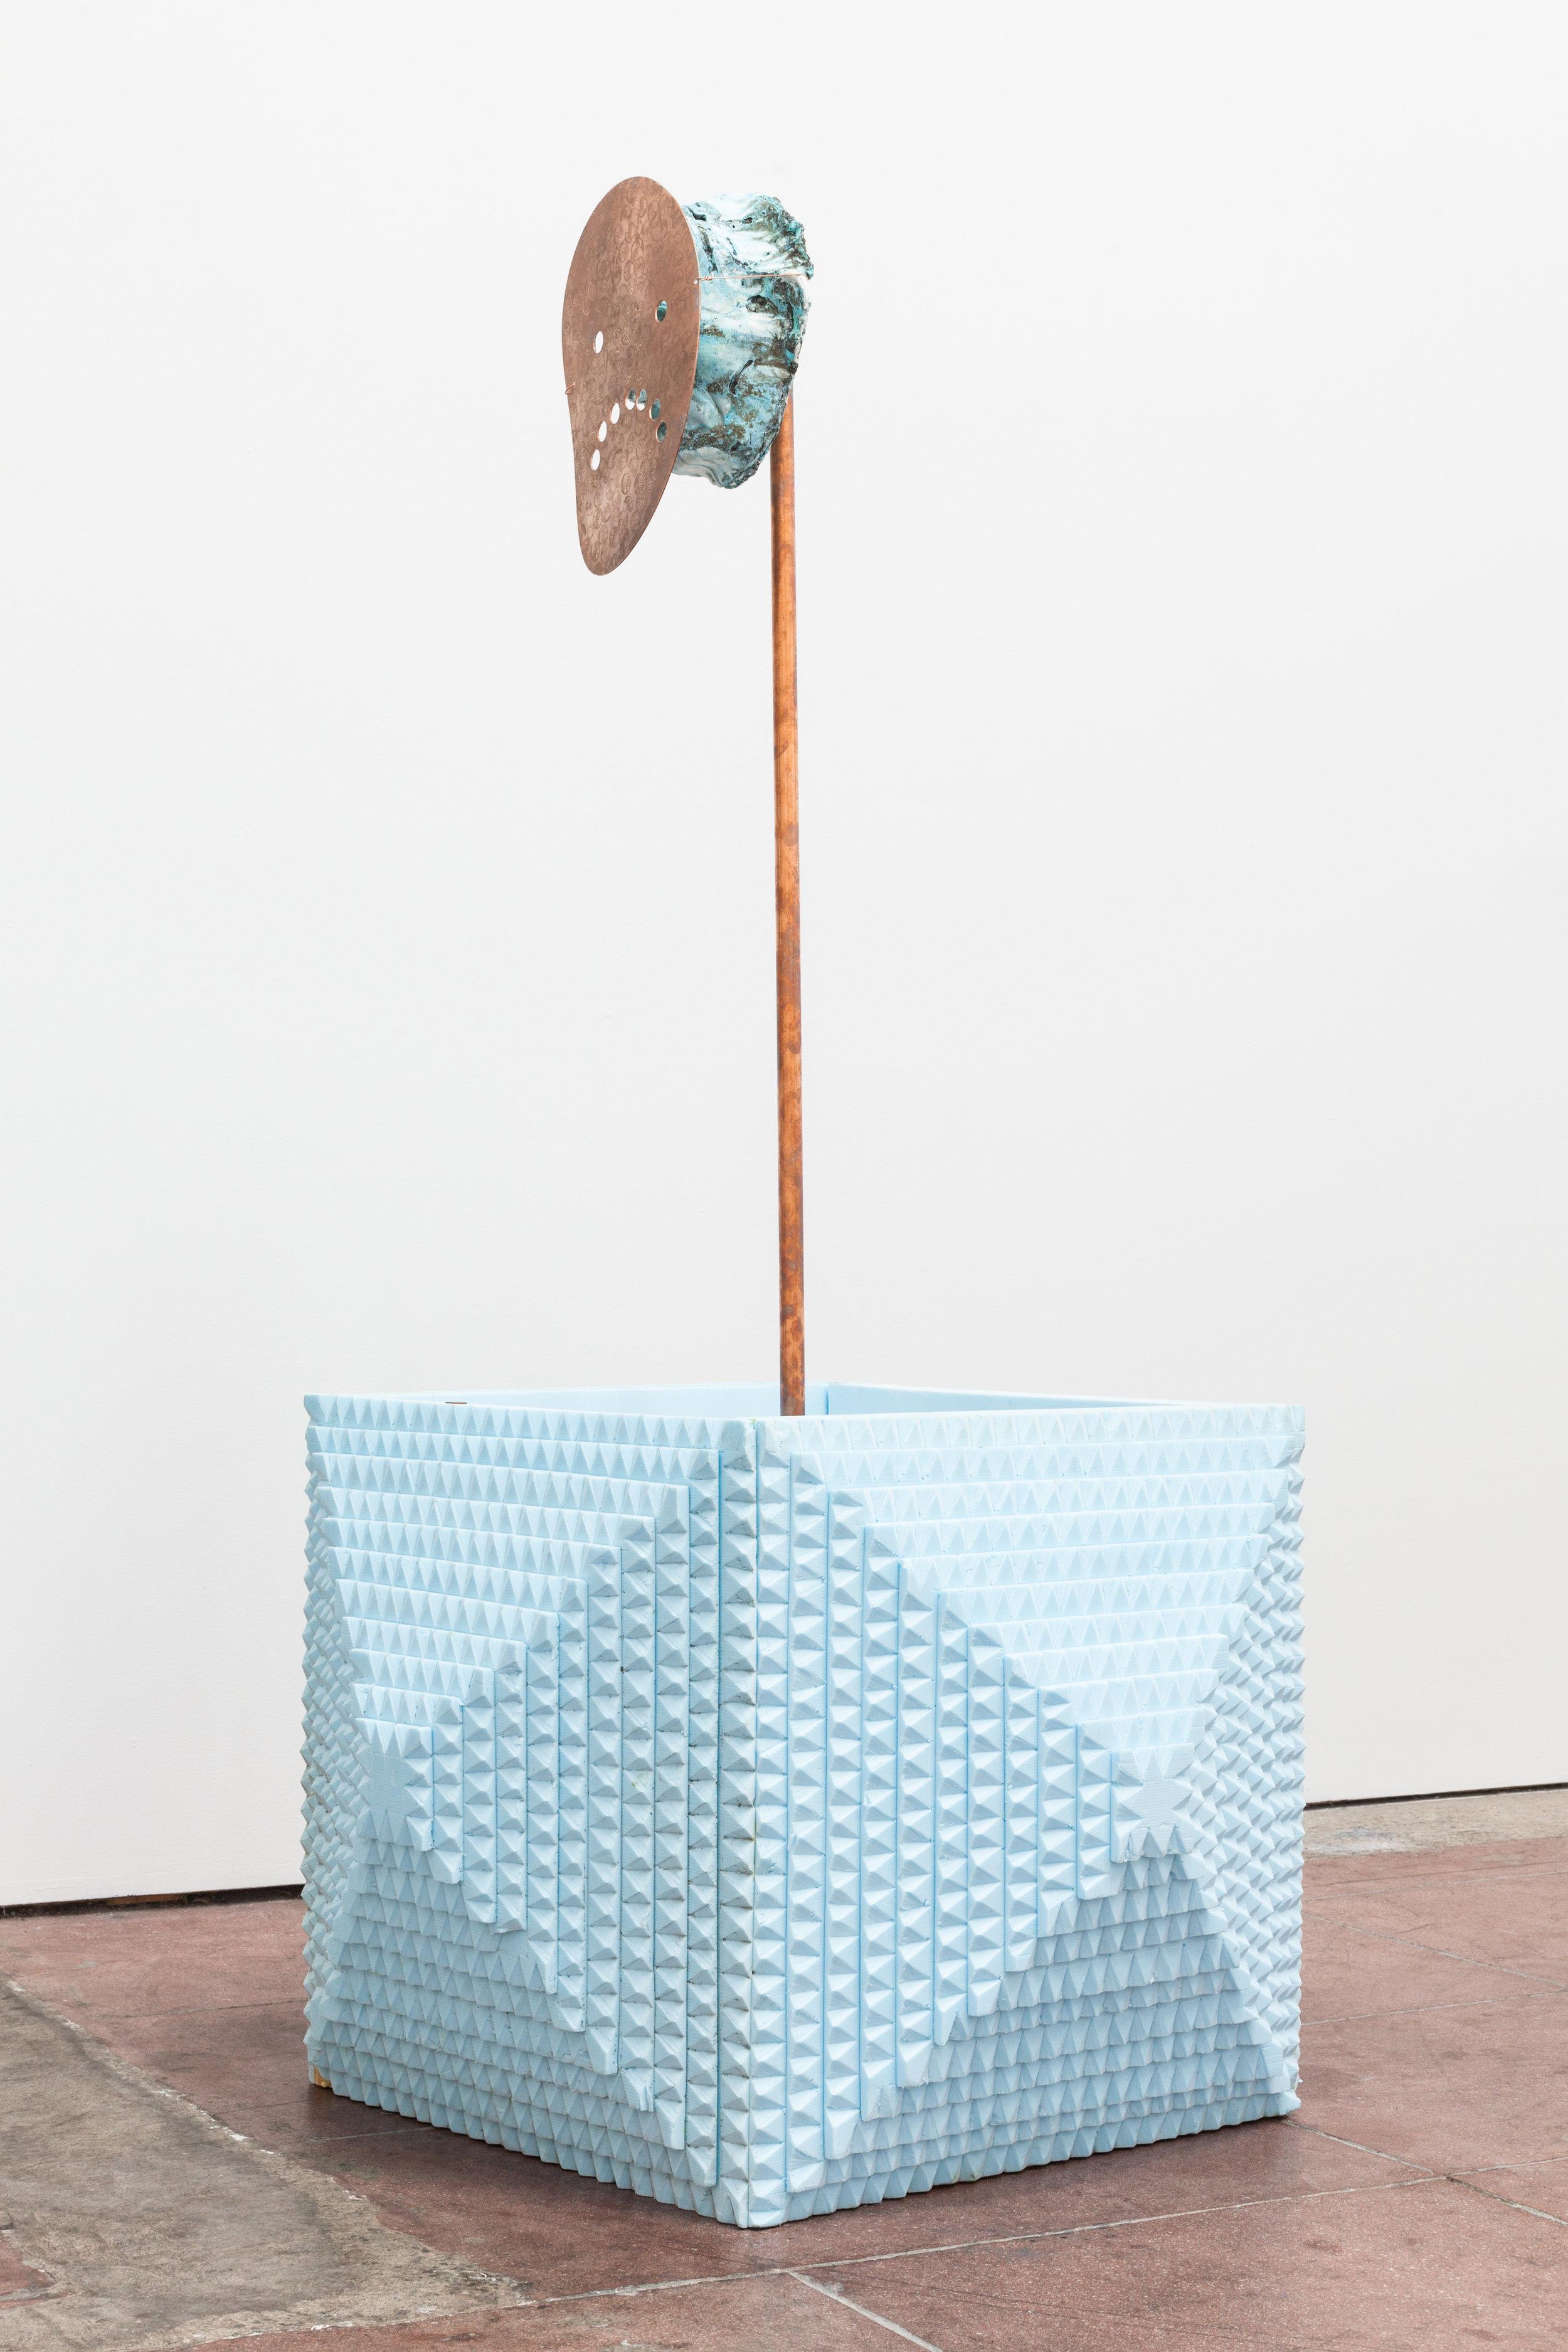 Jory Rabinovitz,    Abe L. as Freddie Mac , 2019, melted pennies, copper, tabby, insulation foam, verdigris pigment, 66 × 37 × 37 inches